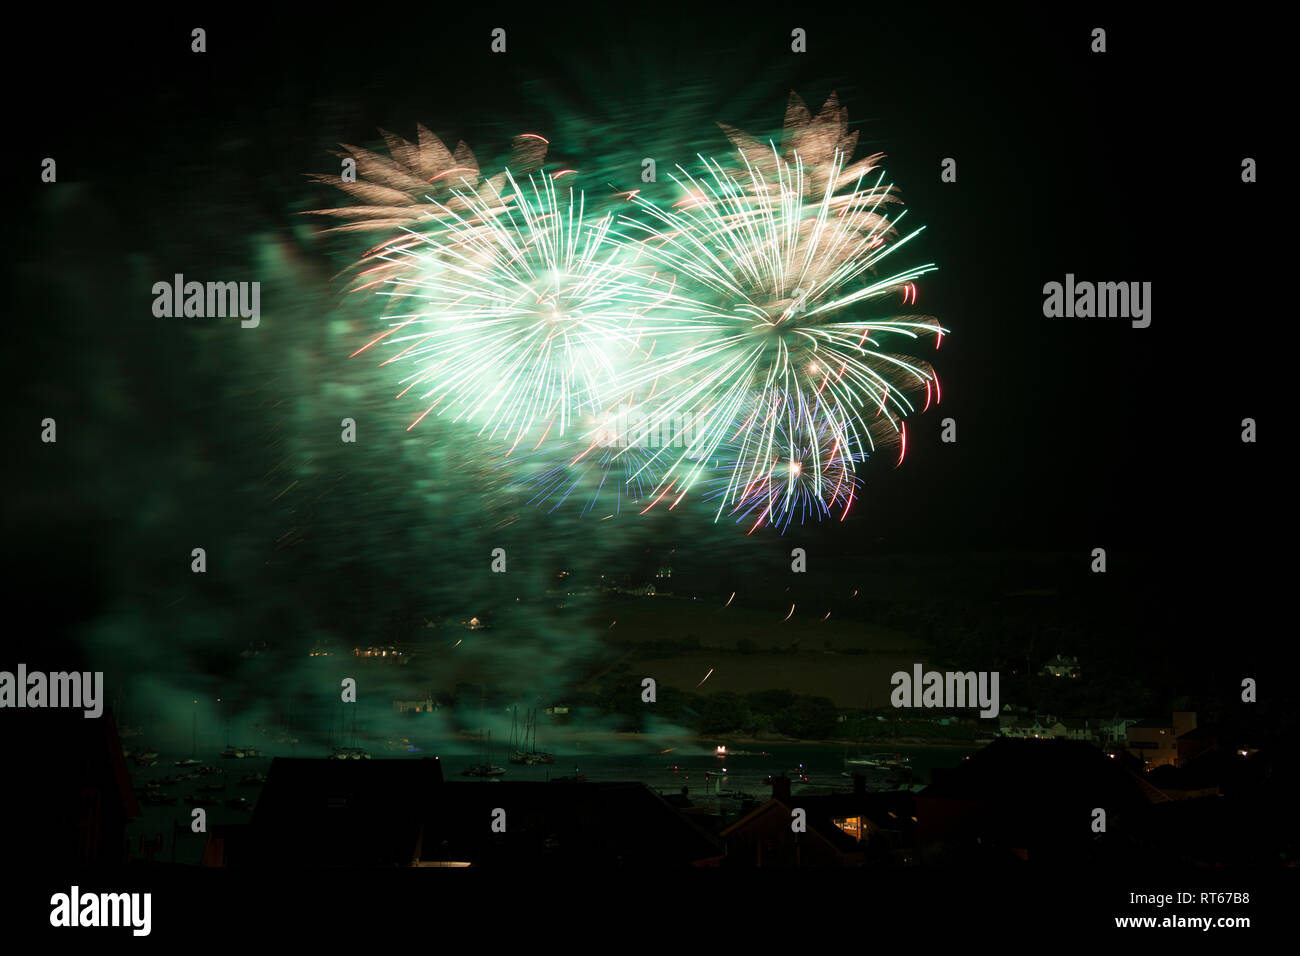 Fireworks over Salcombe Estuary during the Summer regatta, Salcombe, Devon England - Stock Image